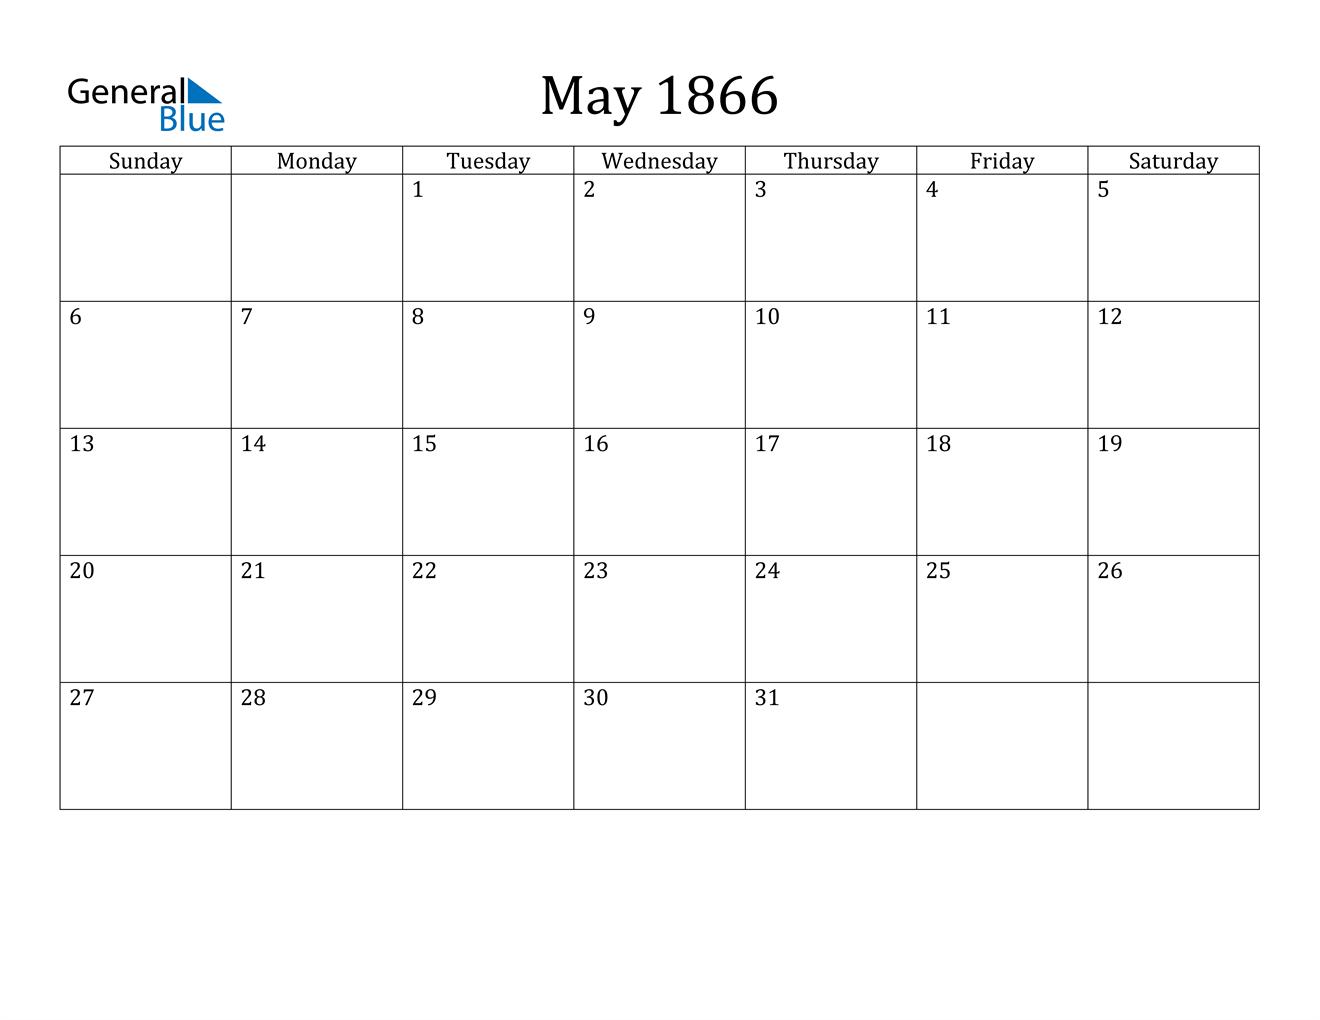 Image of May 1866 Calendar